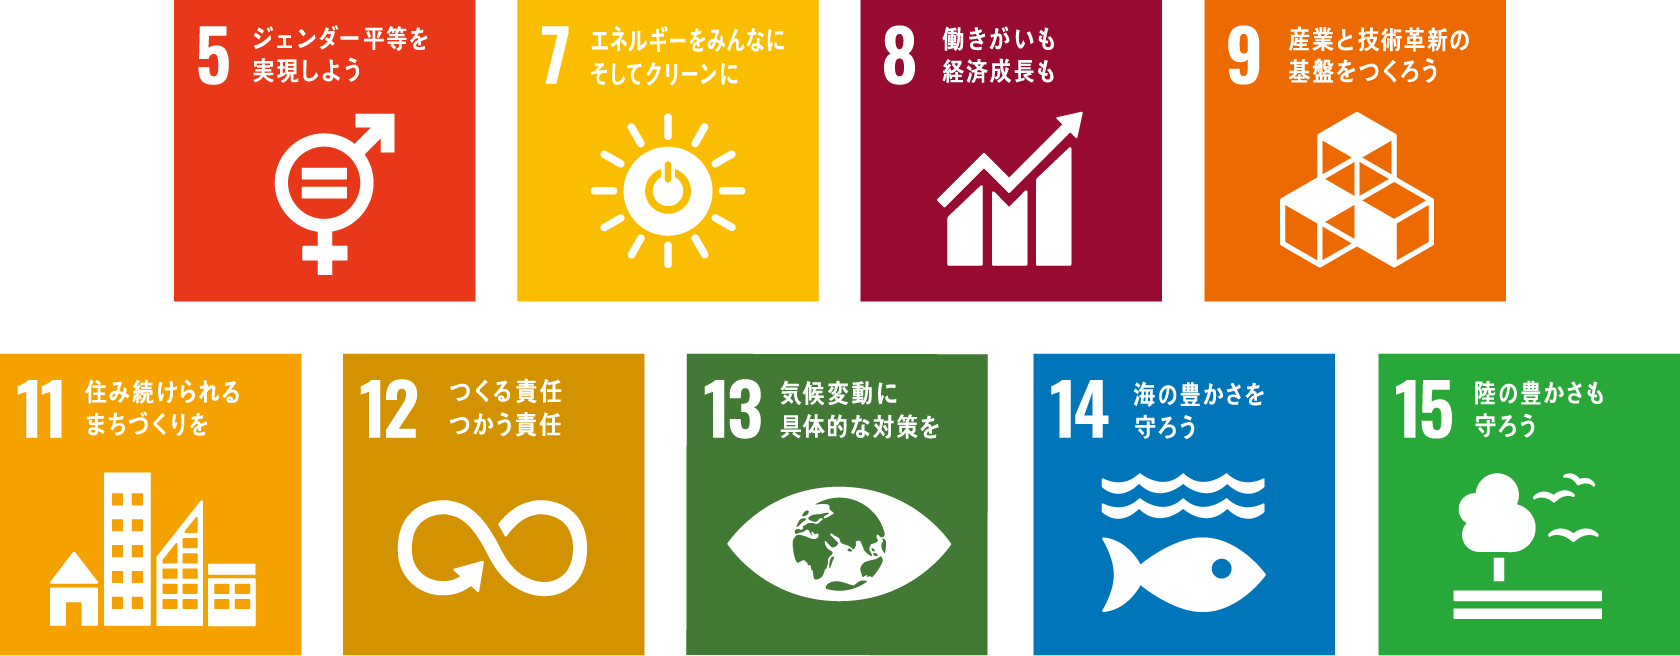 SDGsへの取組み内容